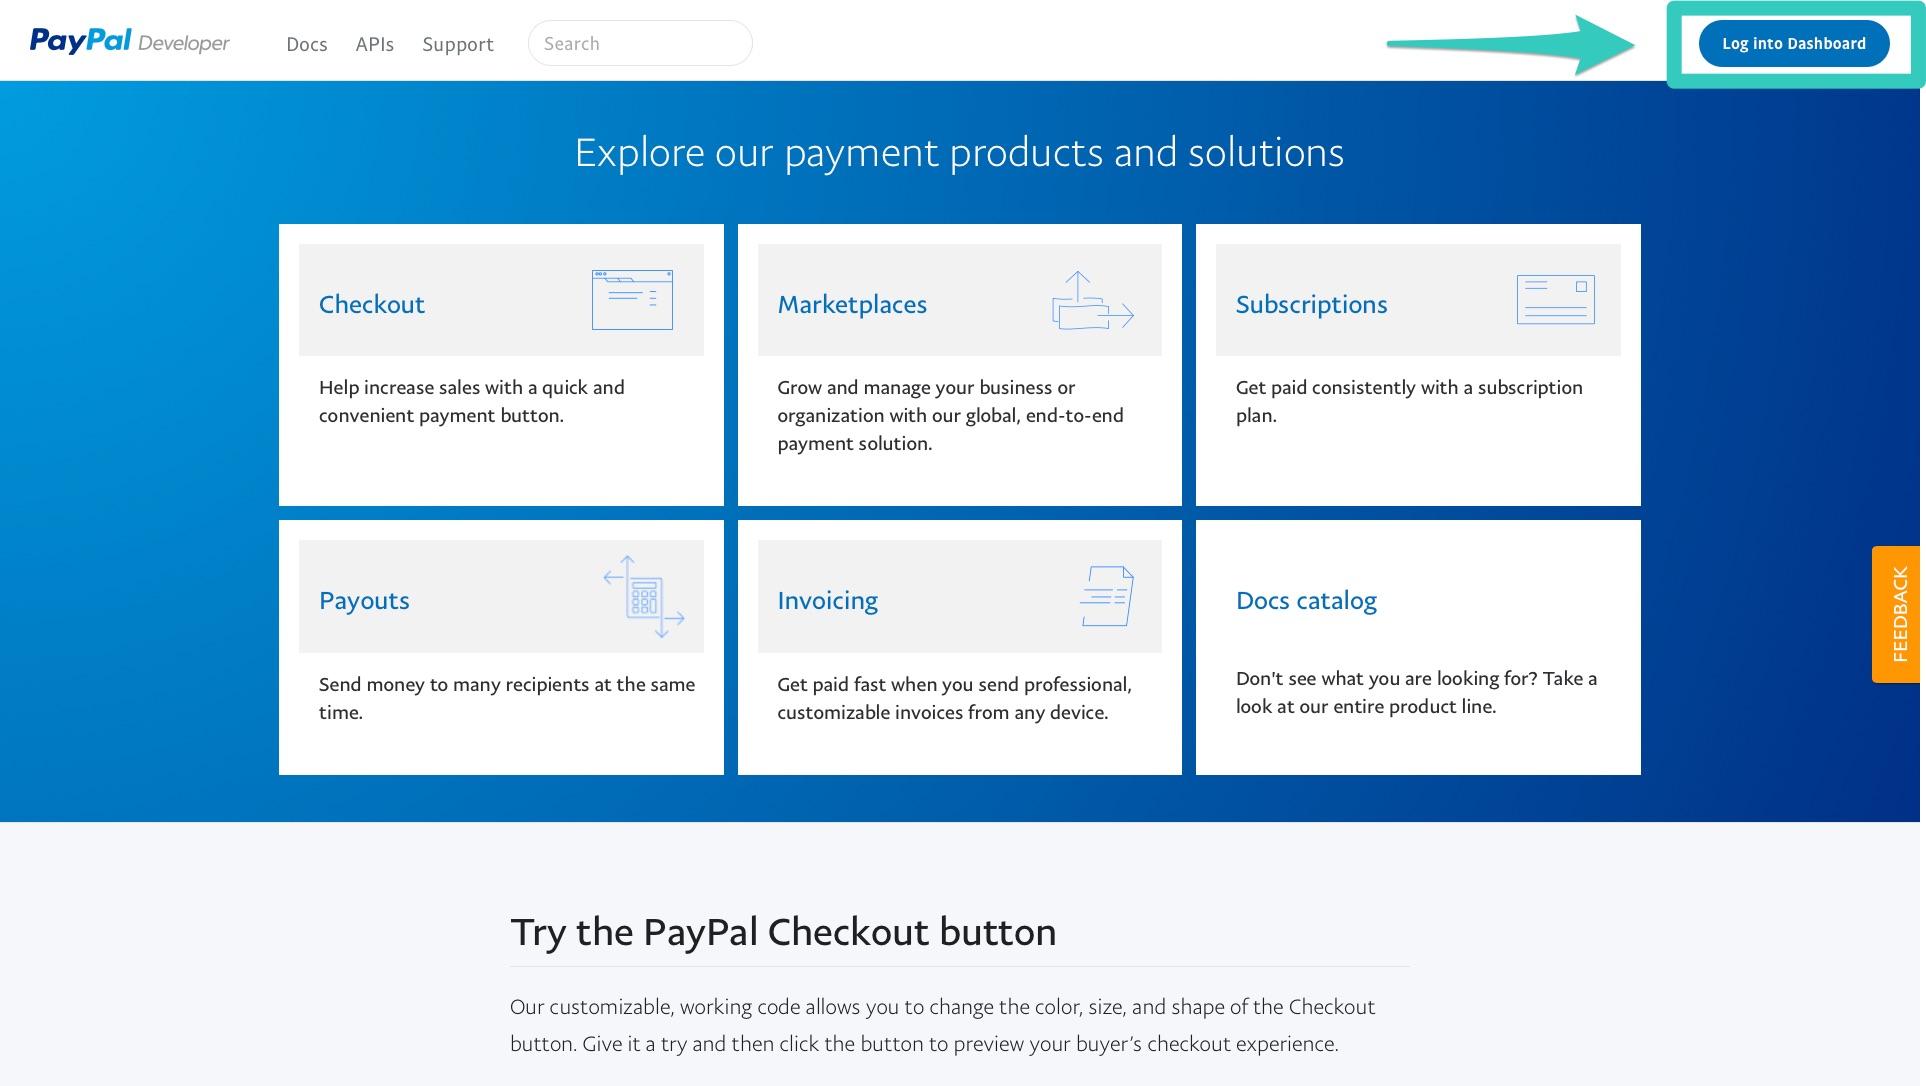 PayPal Dev Login